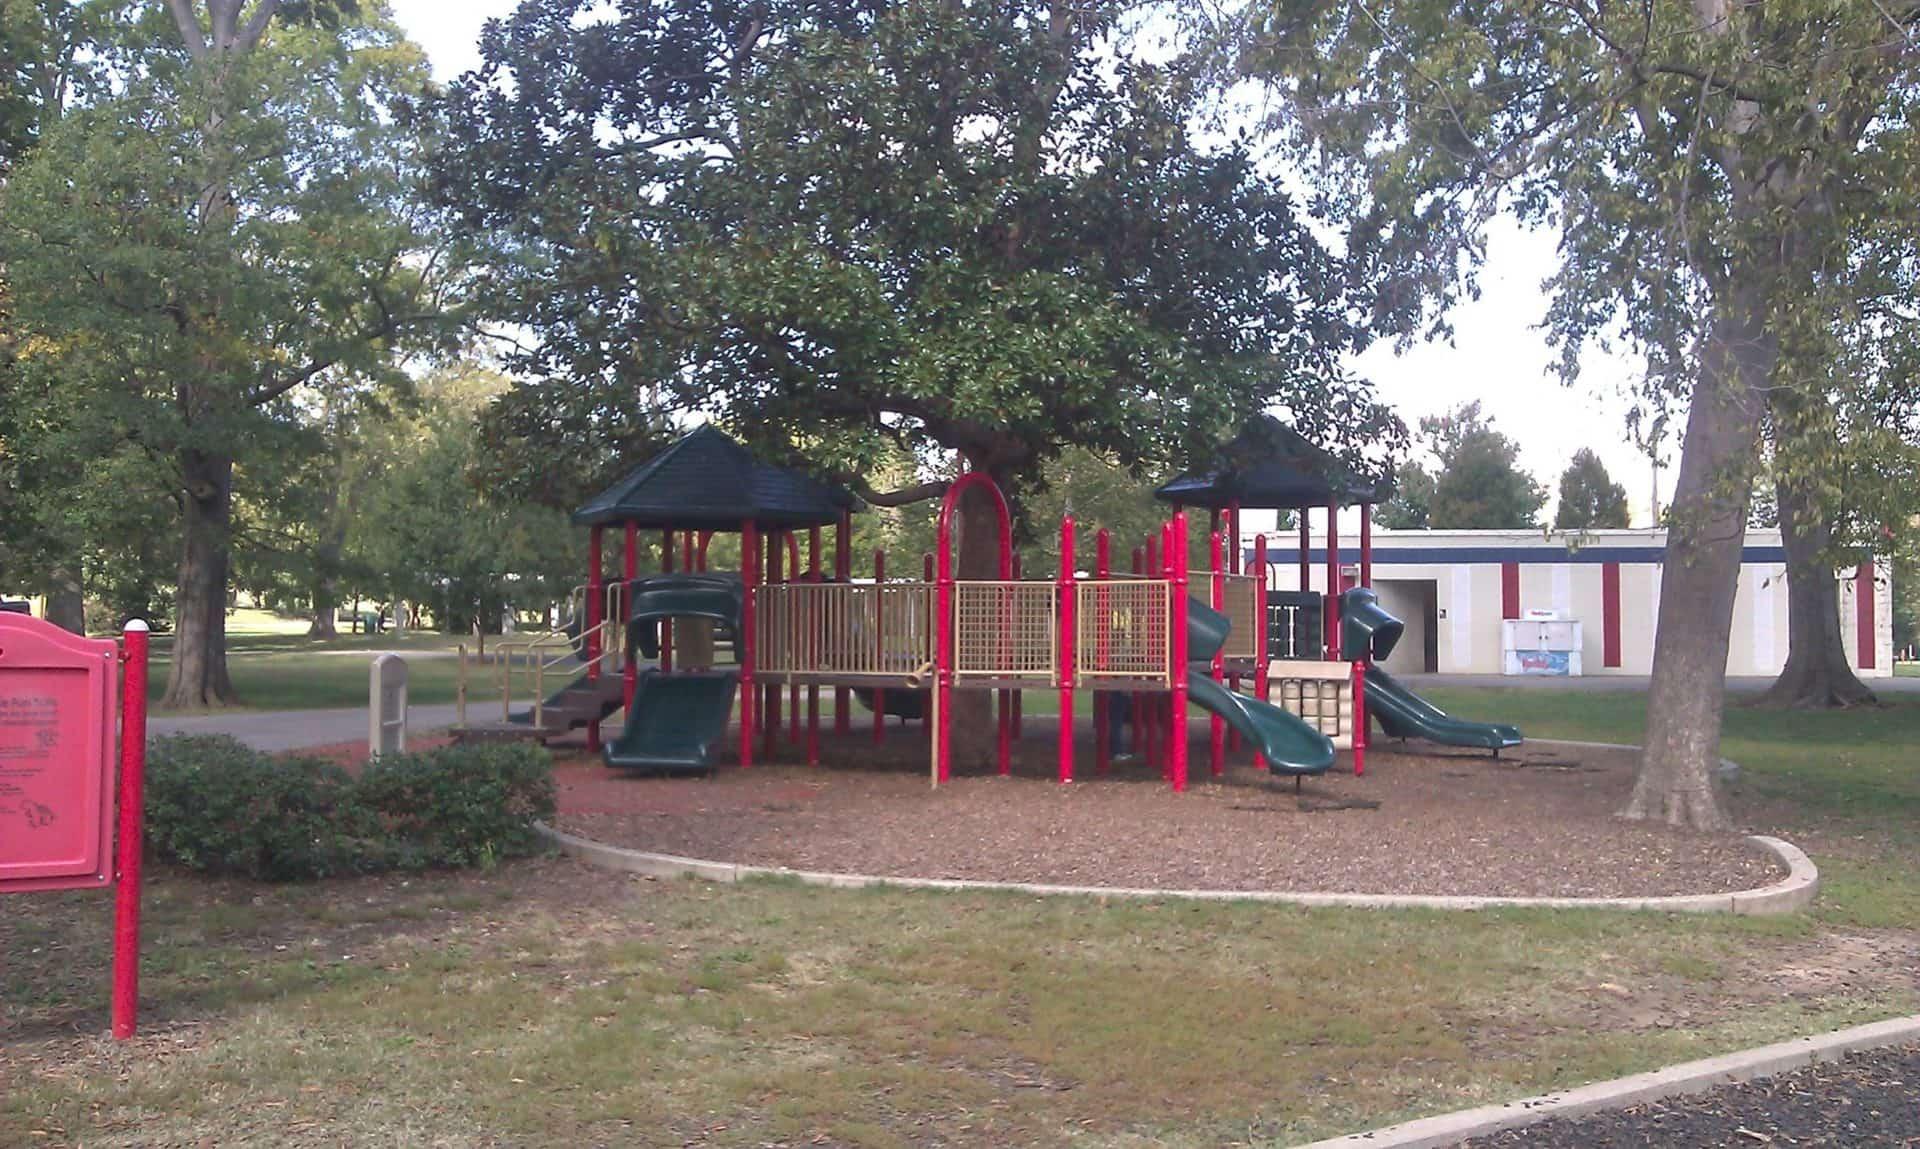 Centennial Park Nashville - Playscape